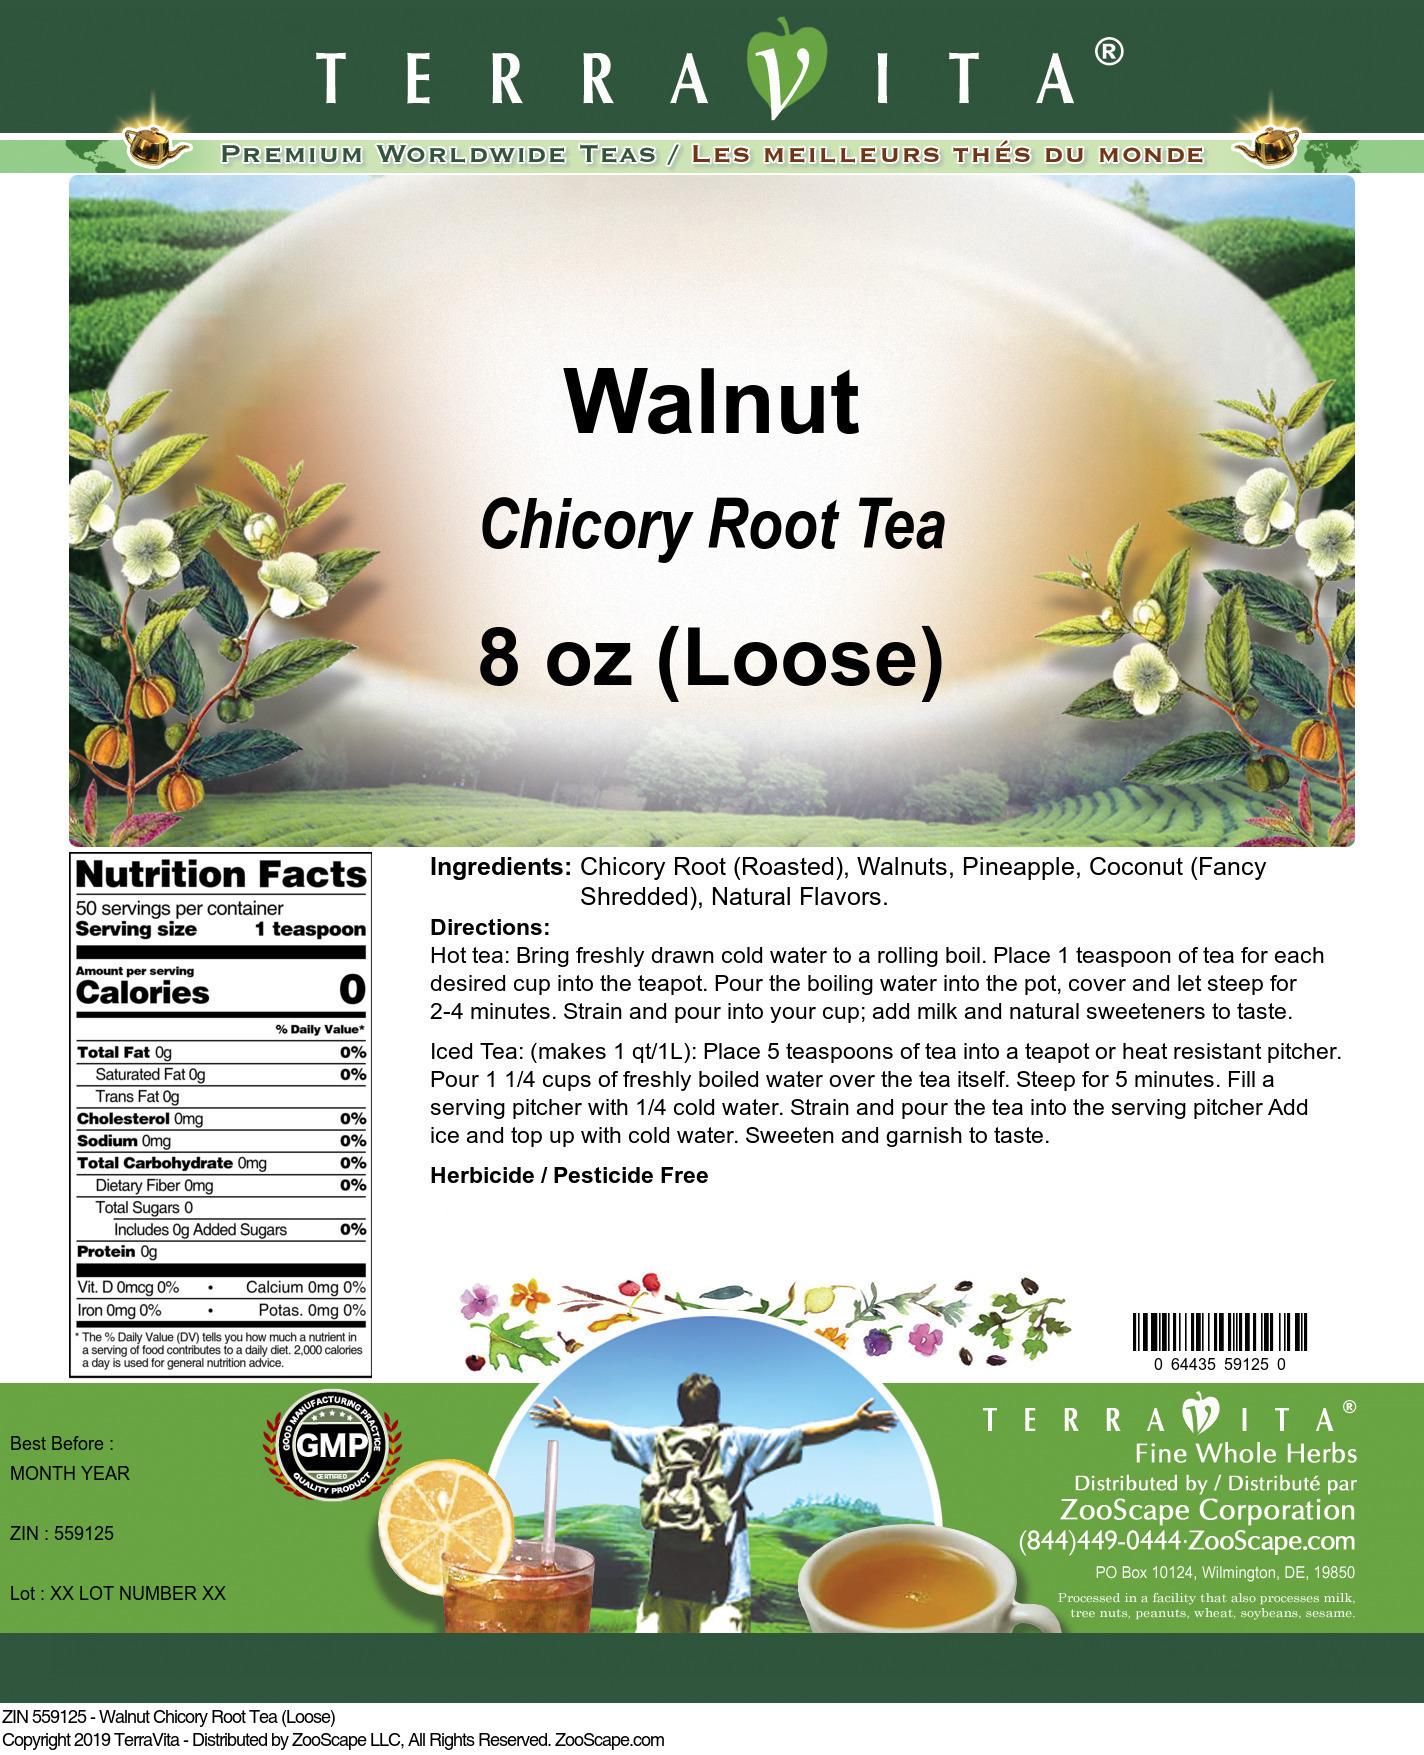 Walnut Chicory Root Tea (Loose)